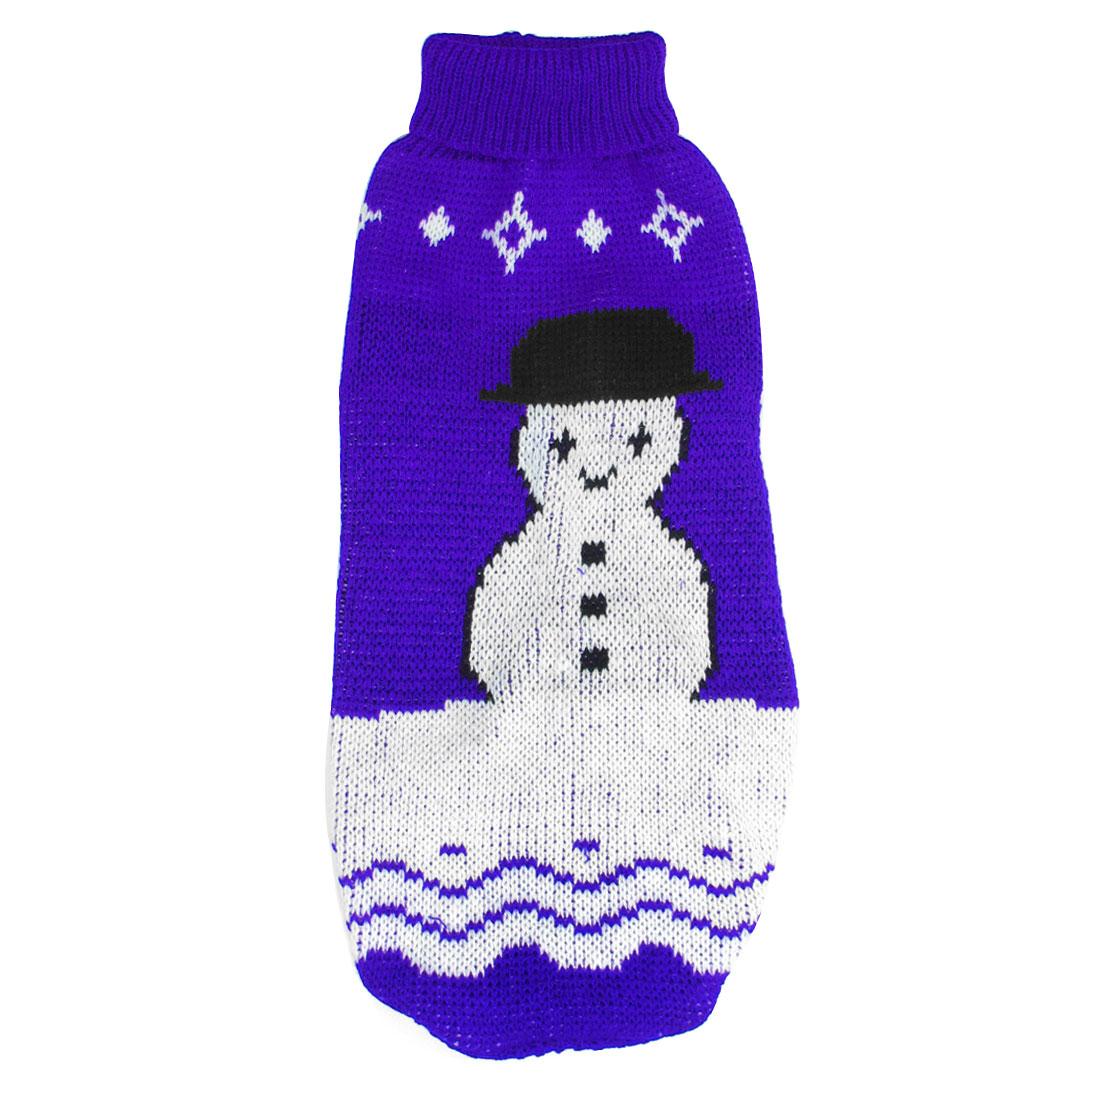 Blue White Black Snowman Print Pet Dog Turtleneck Sweater Apparel Size S